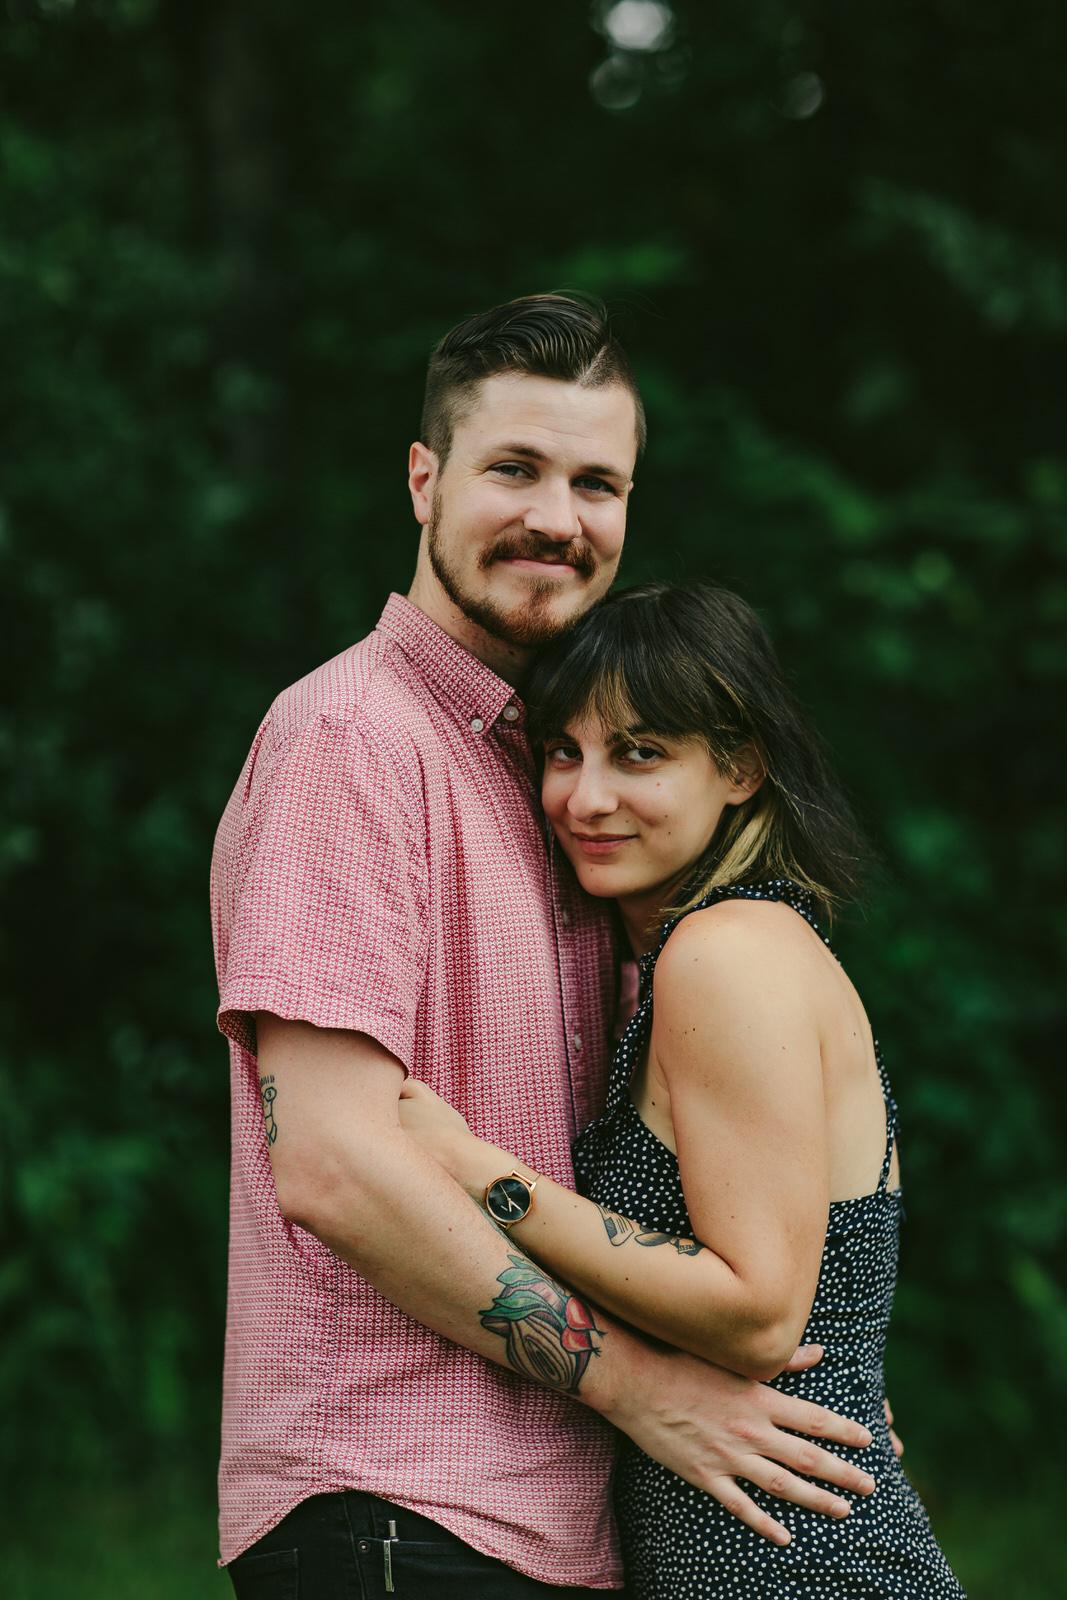 rad-tattooed-couples-photographer-tiny-house-photo-murray-hill-jacksonville-florida.jpg